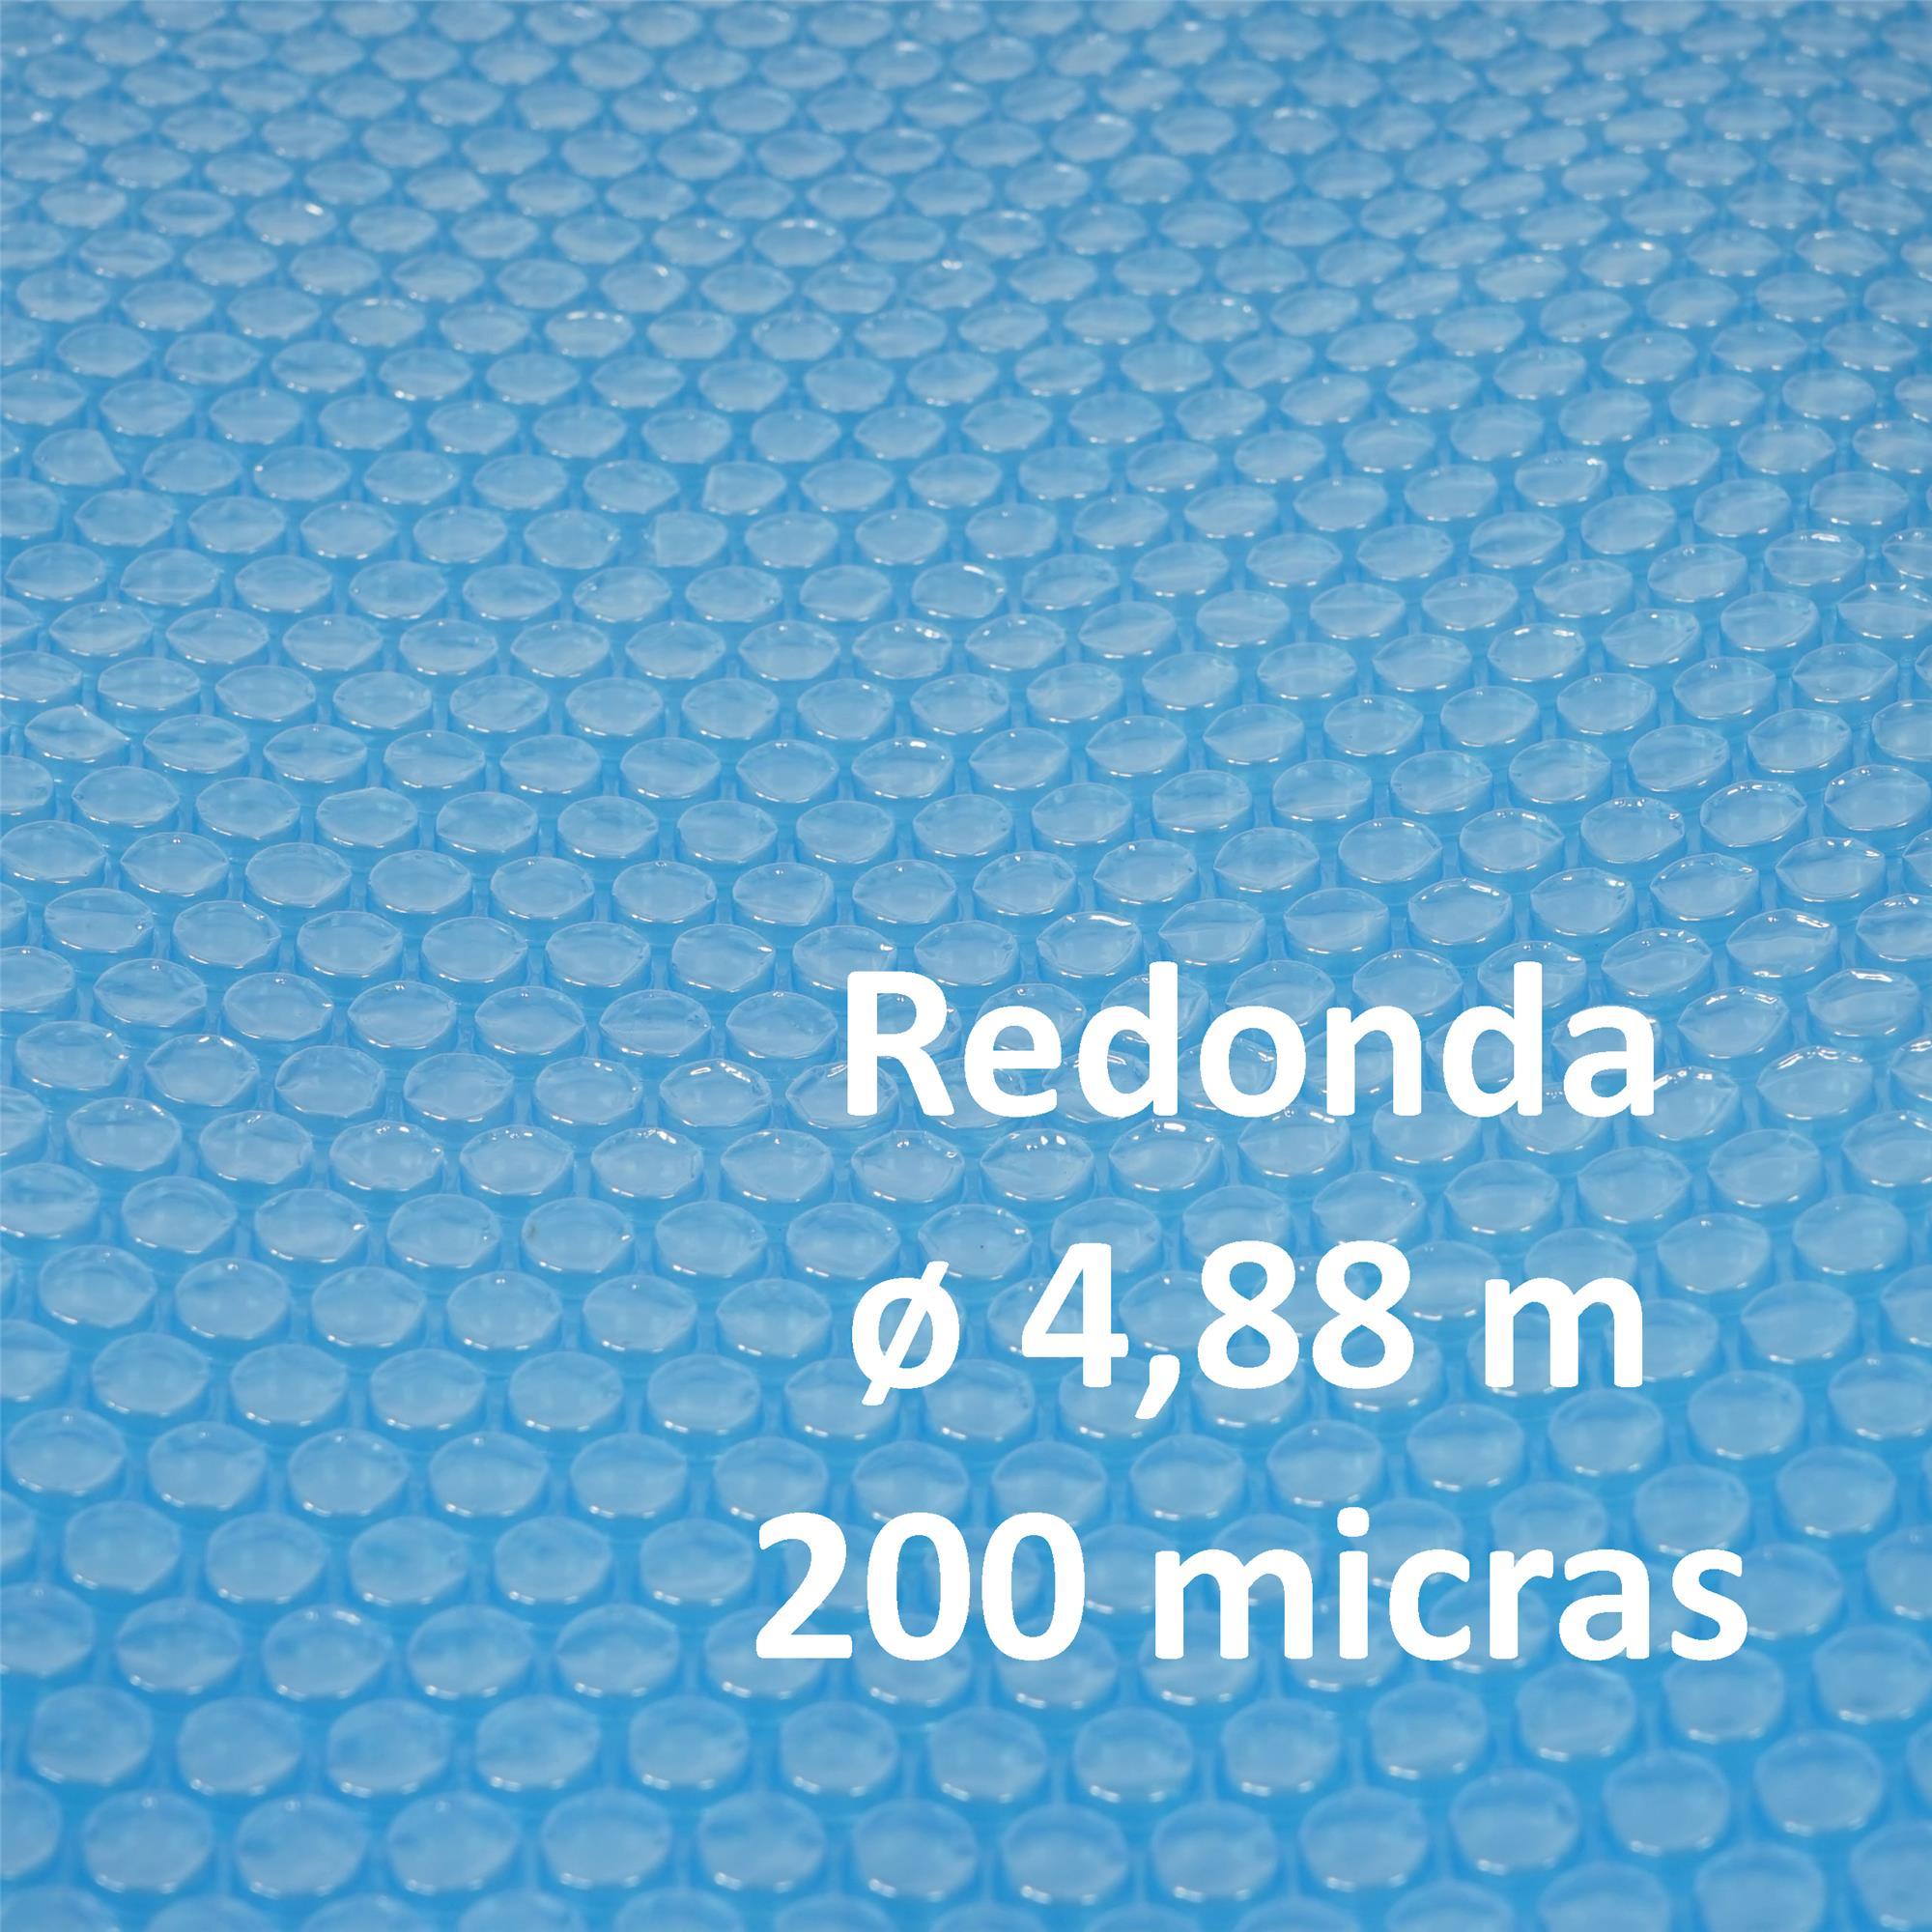 Cubierta lona t rmica piscina dimensiones 4 88 metros for Lona termica piscina